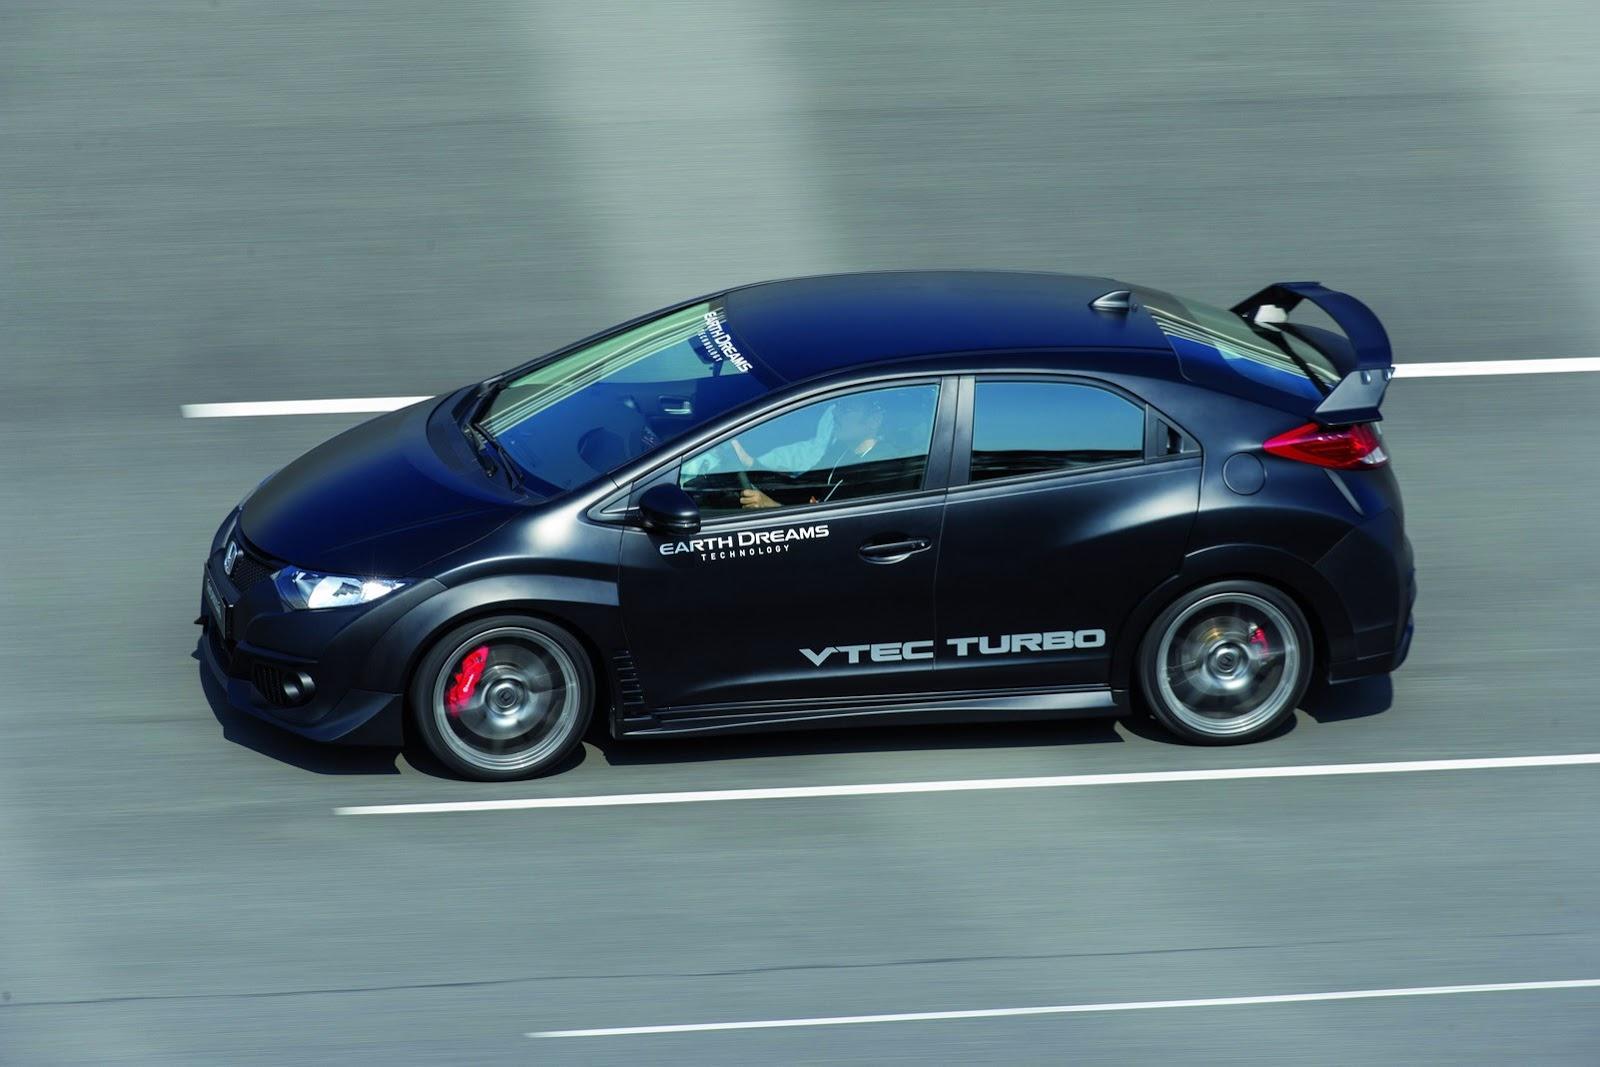 Honda Reveals New Civic Type R With VTEC TURBO Engine [Video ...